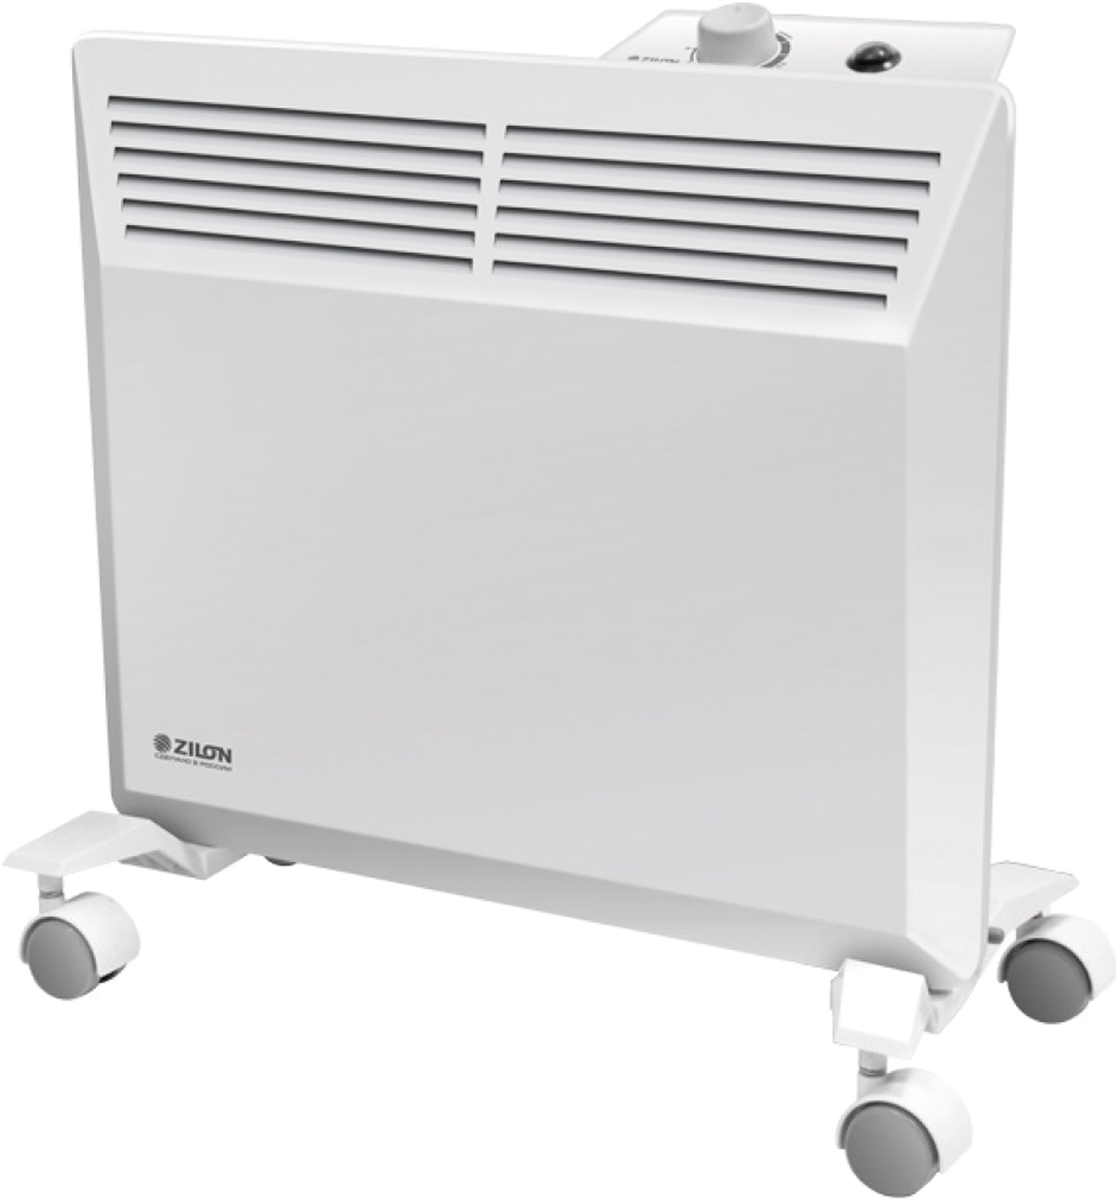 ZILON ZHC-1500 А электрический конвектор